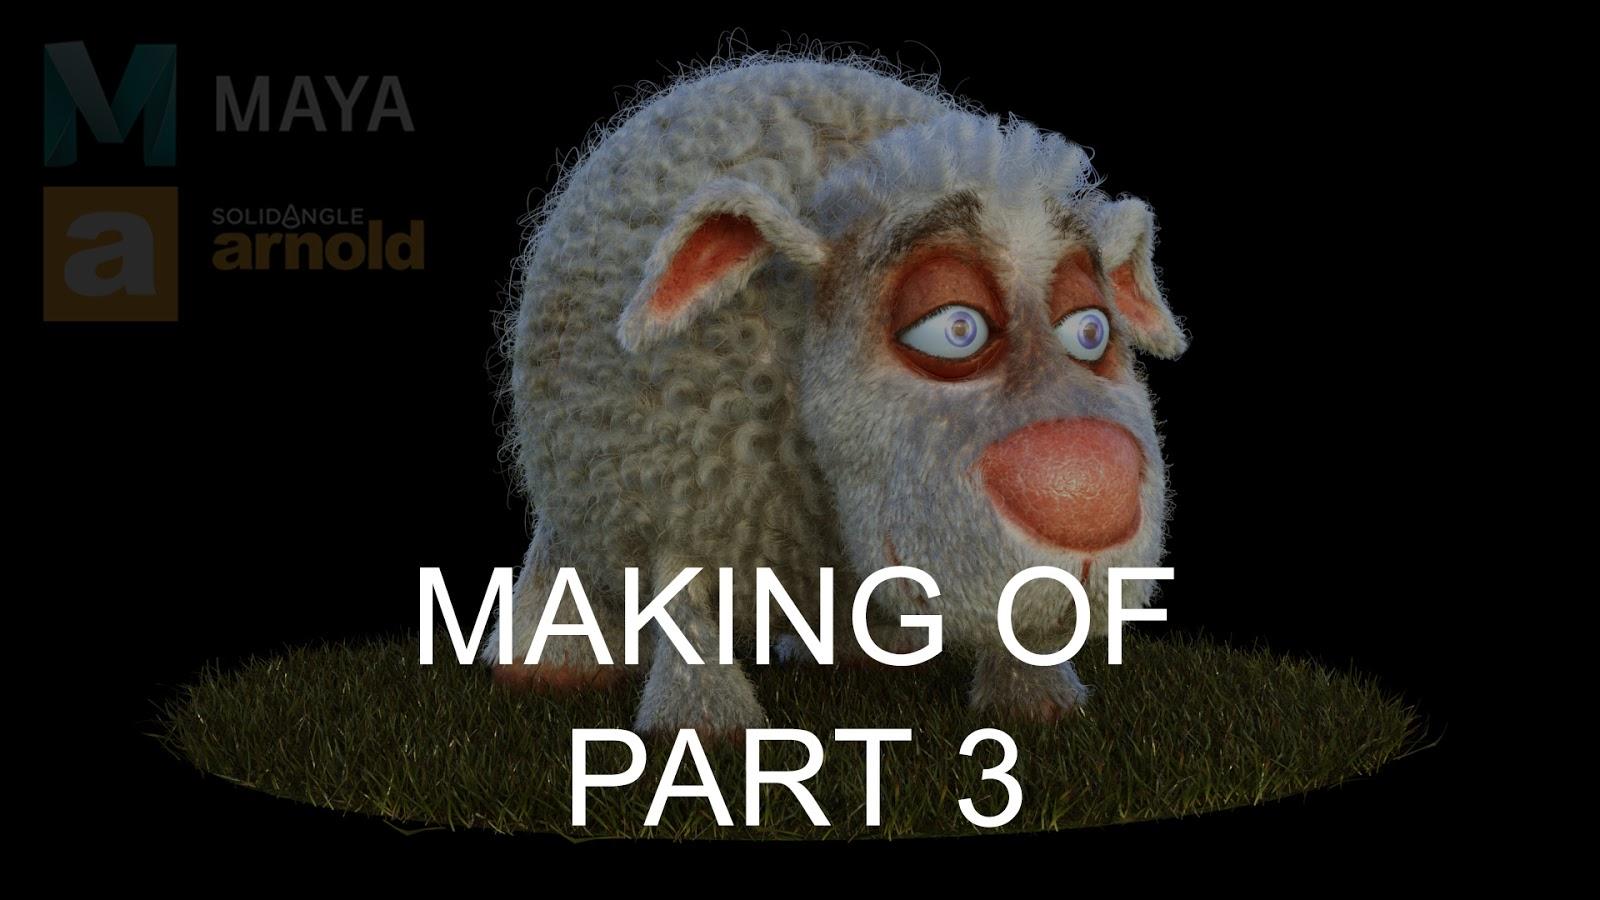 makingofshido_maya_arnold.jpg